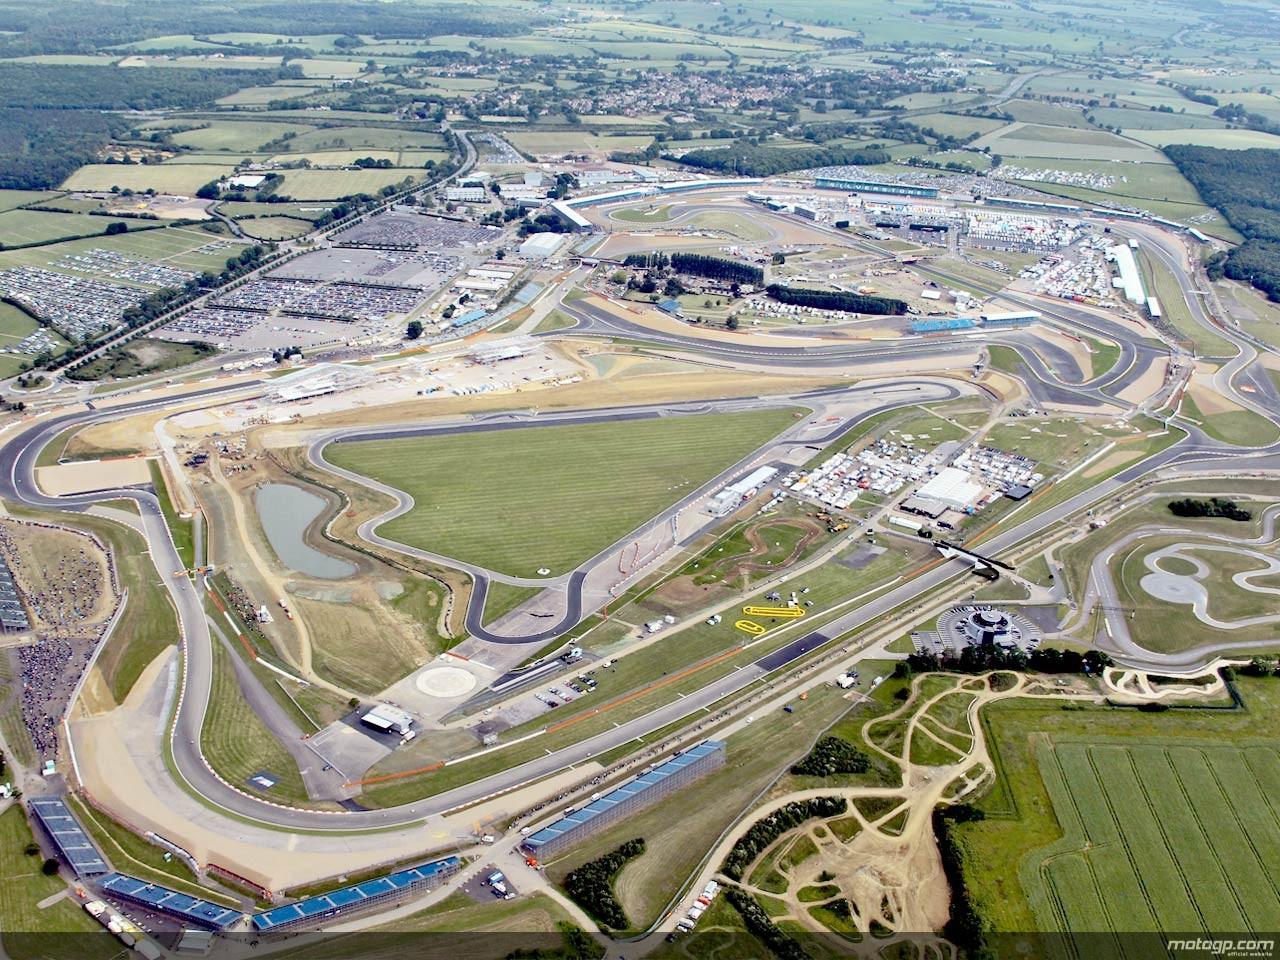 motogp.com · Aerial view of Silverstone circuit